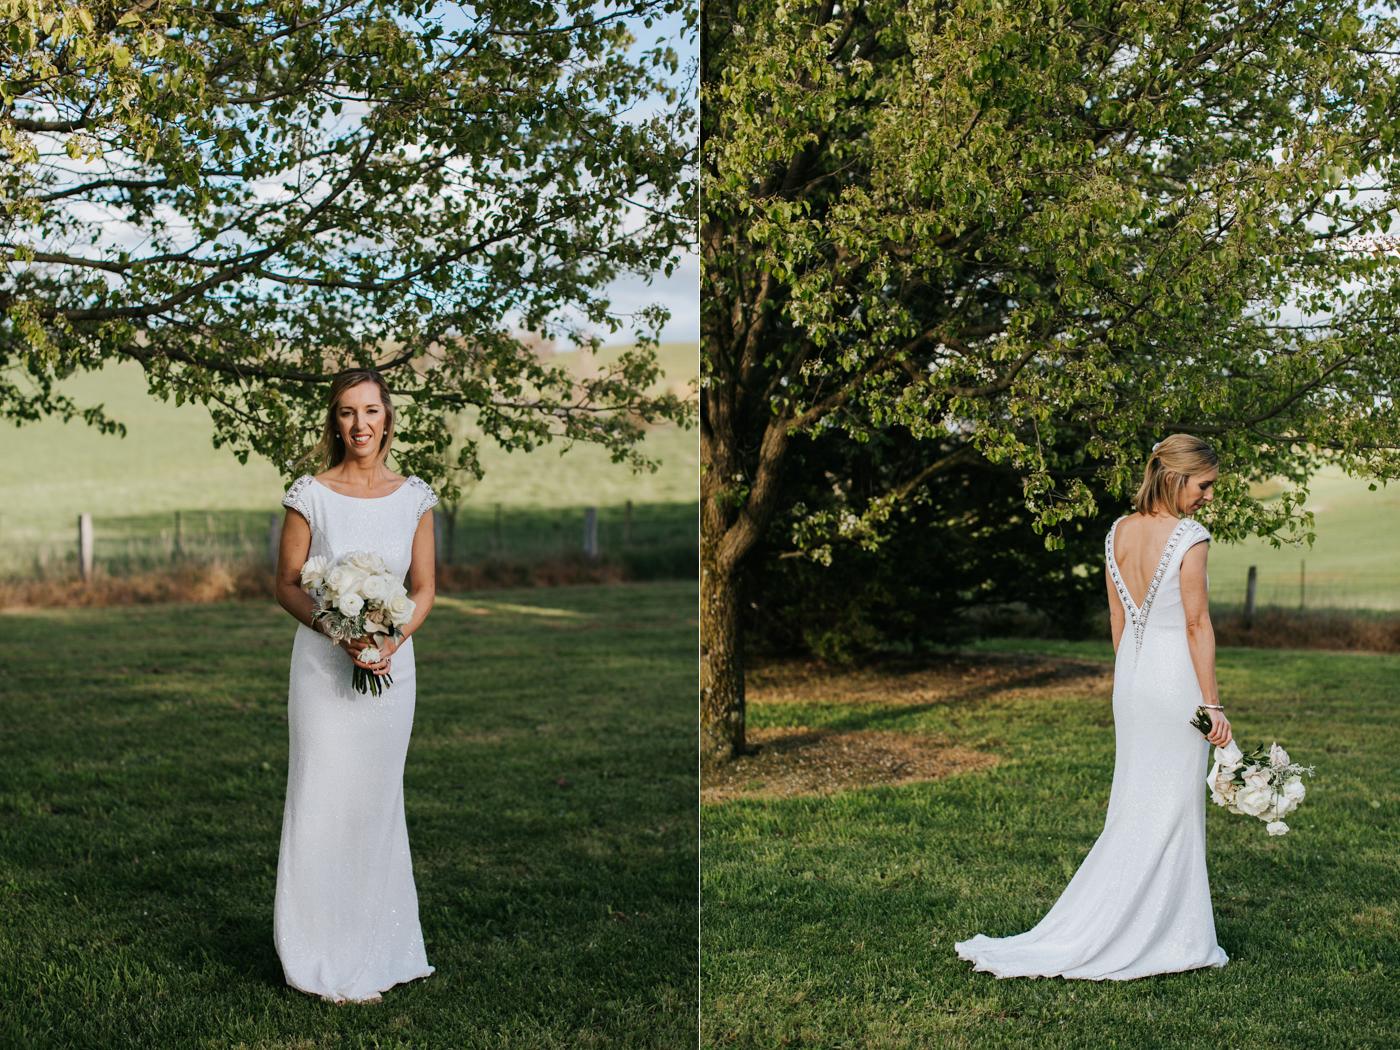 Bridget & James - Orange Country Wedding - Samantha Heather Photography-112.jpg